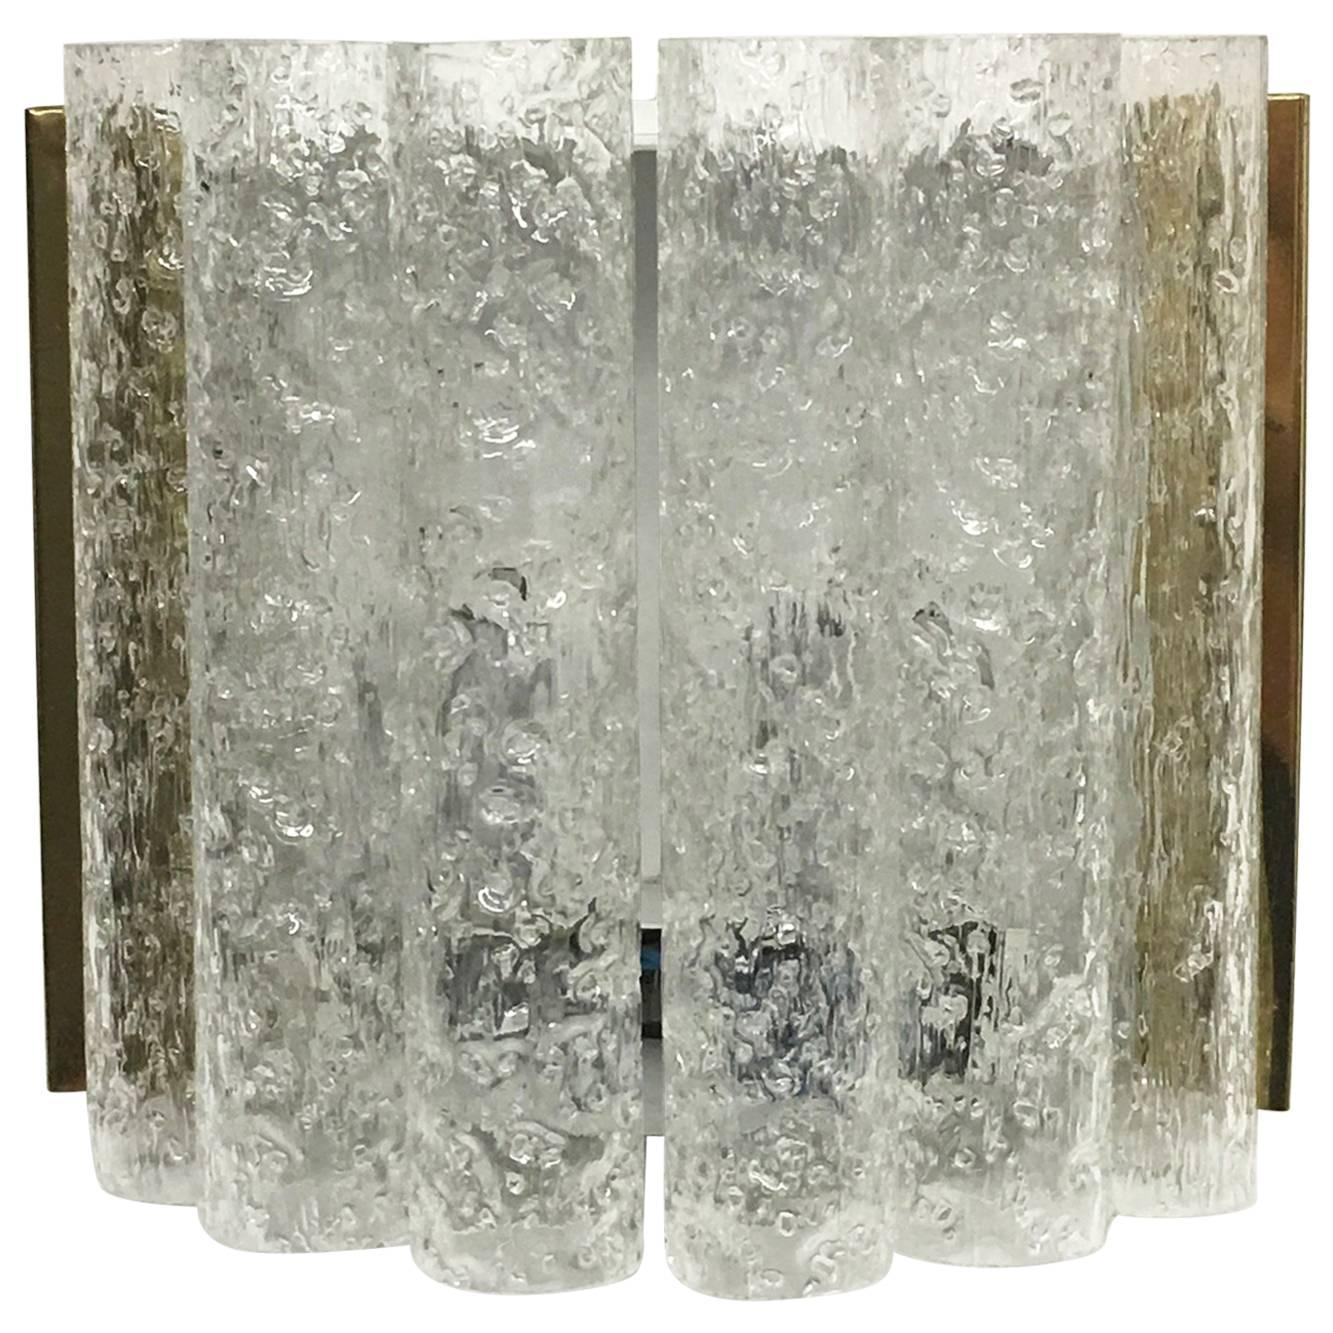 Chic 1960s German Brass Six Tubes Doria Glass Sconces